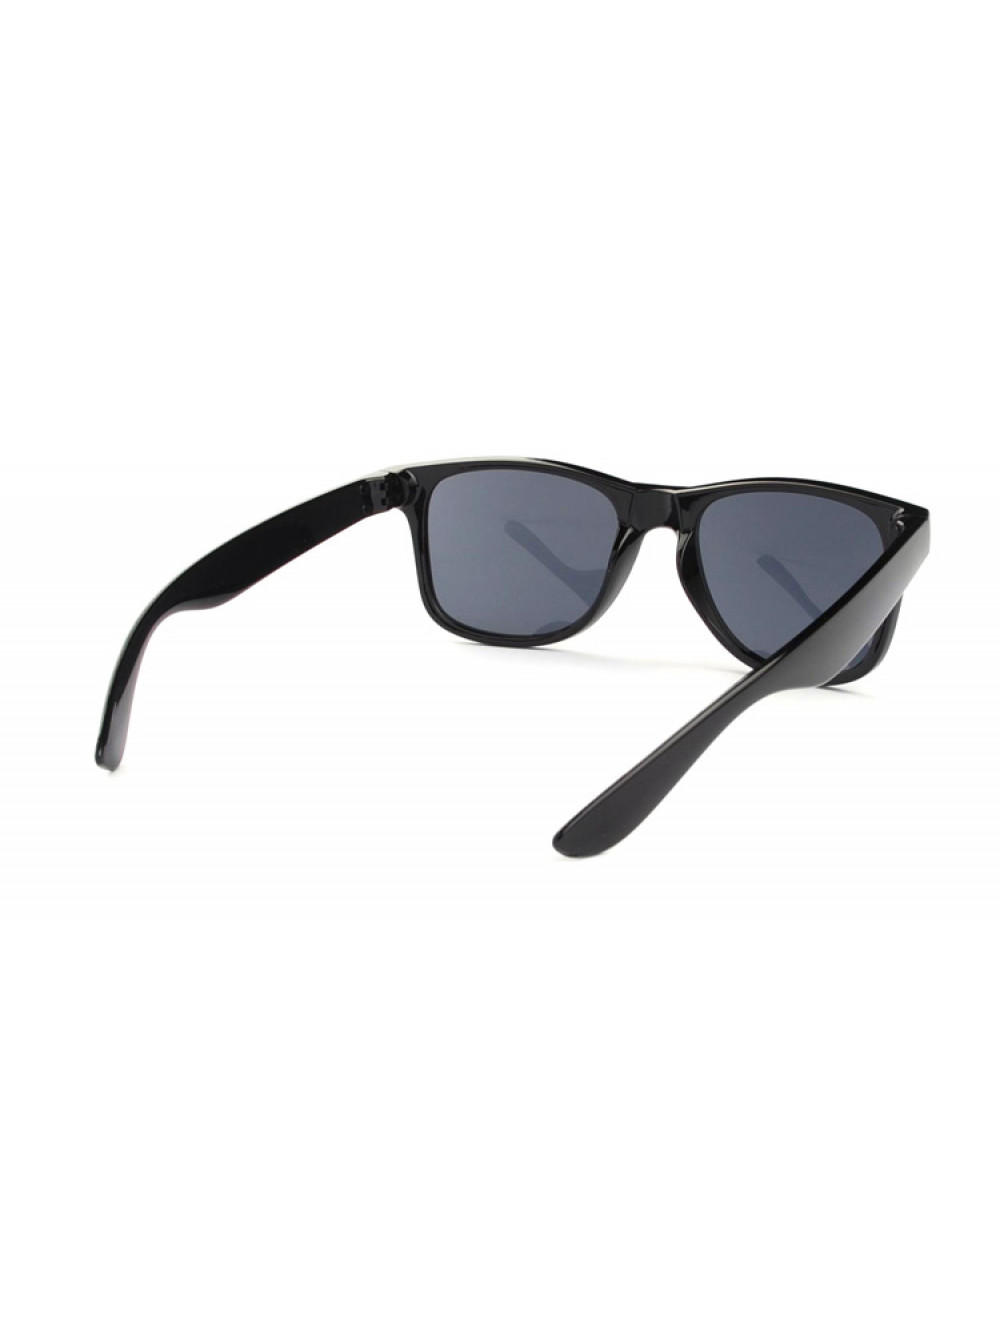 Slnečné okuliare Wayfarer Classic Black b8550cb7ecc